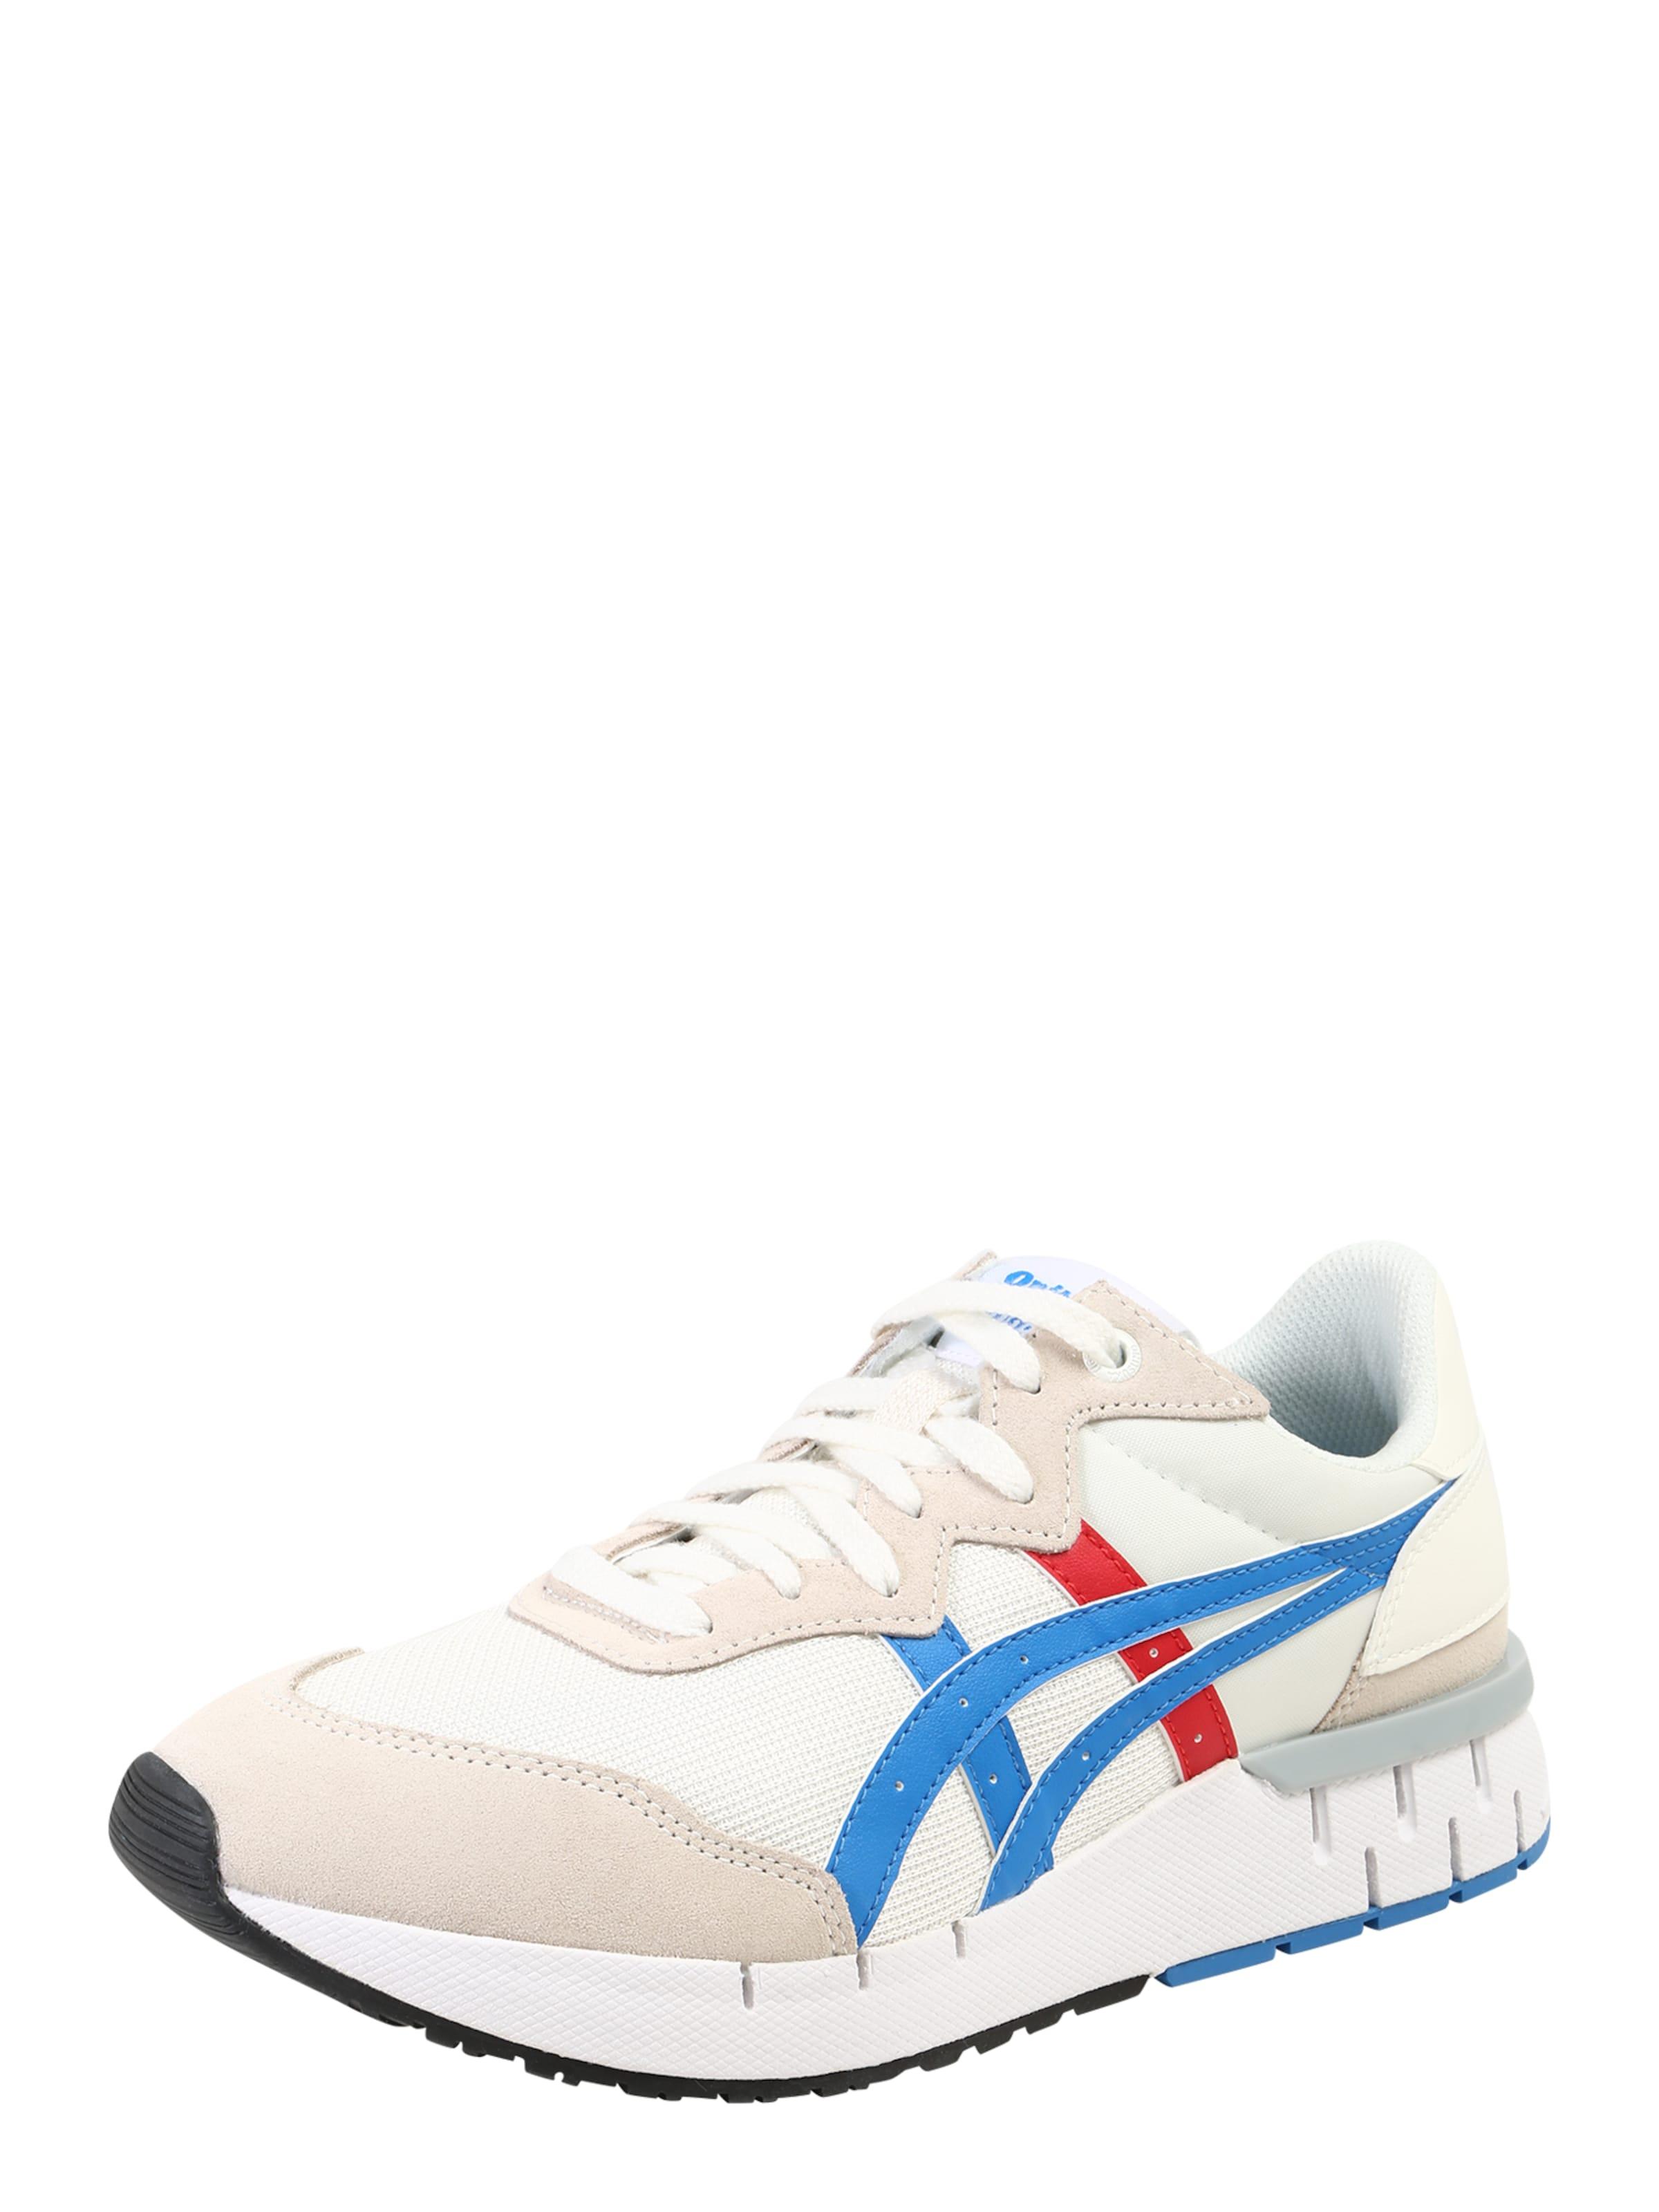 Offwhite 'contemporized In CremeBlau Runner' Tiger Sneaker Onitsuka n8Pkw0O